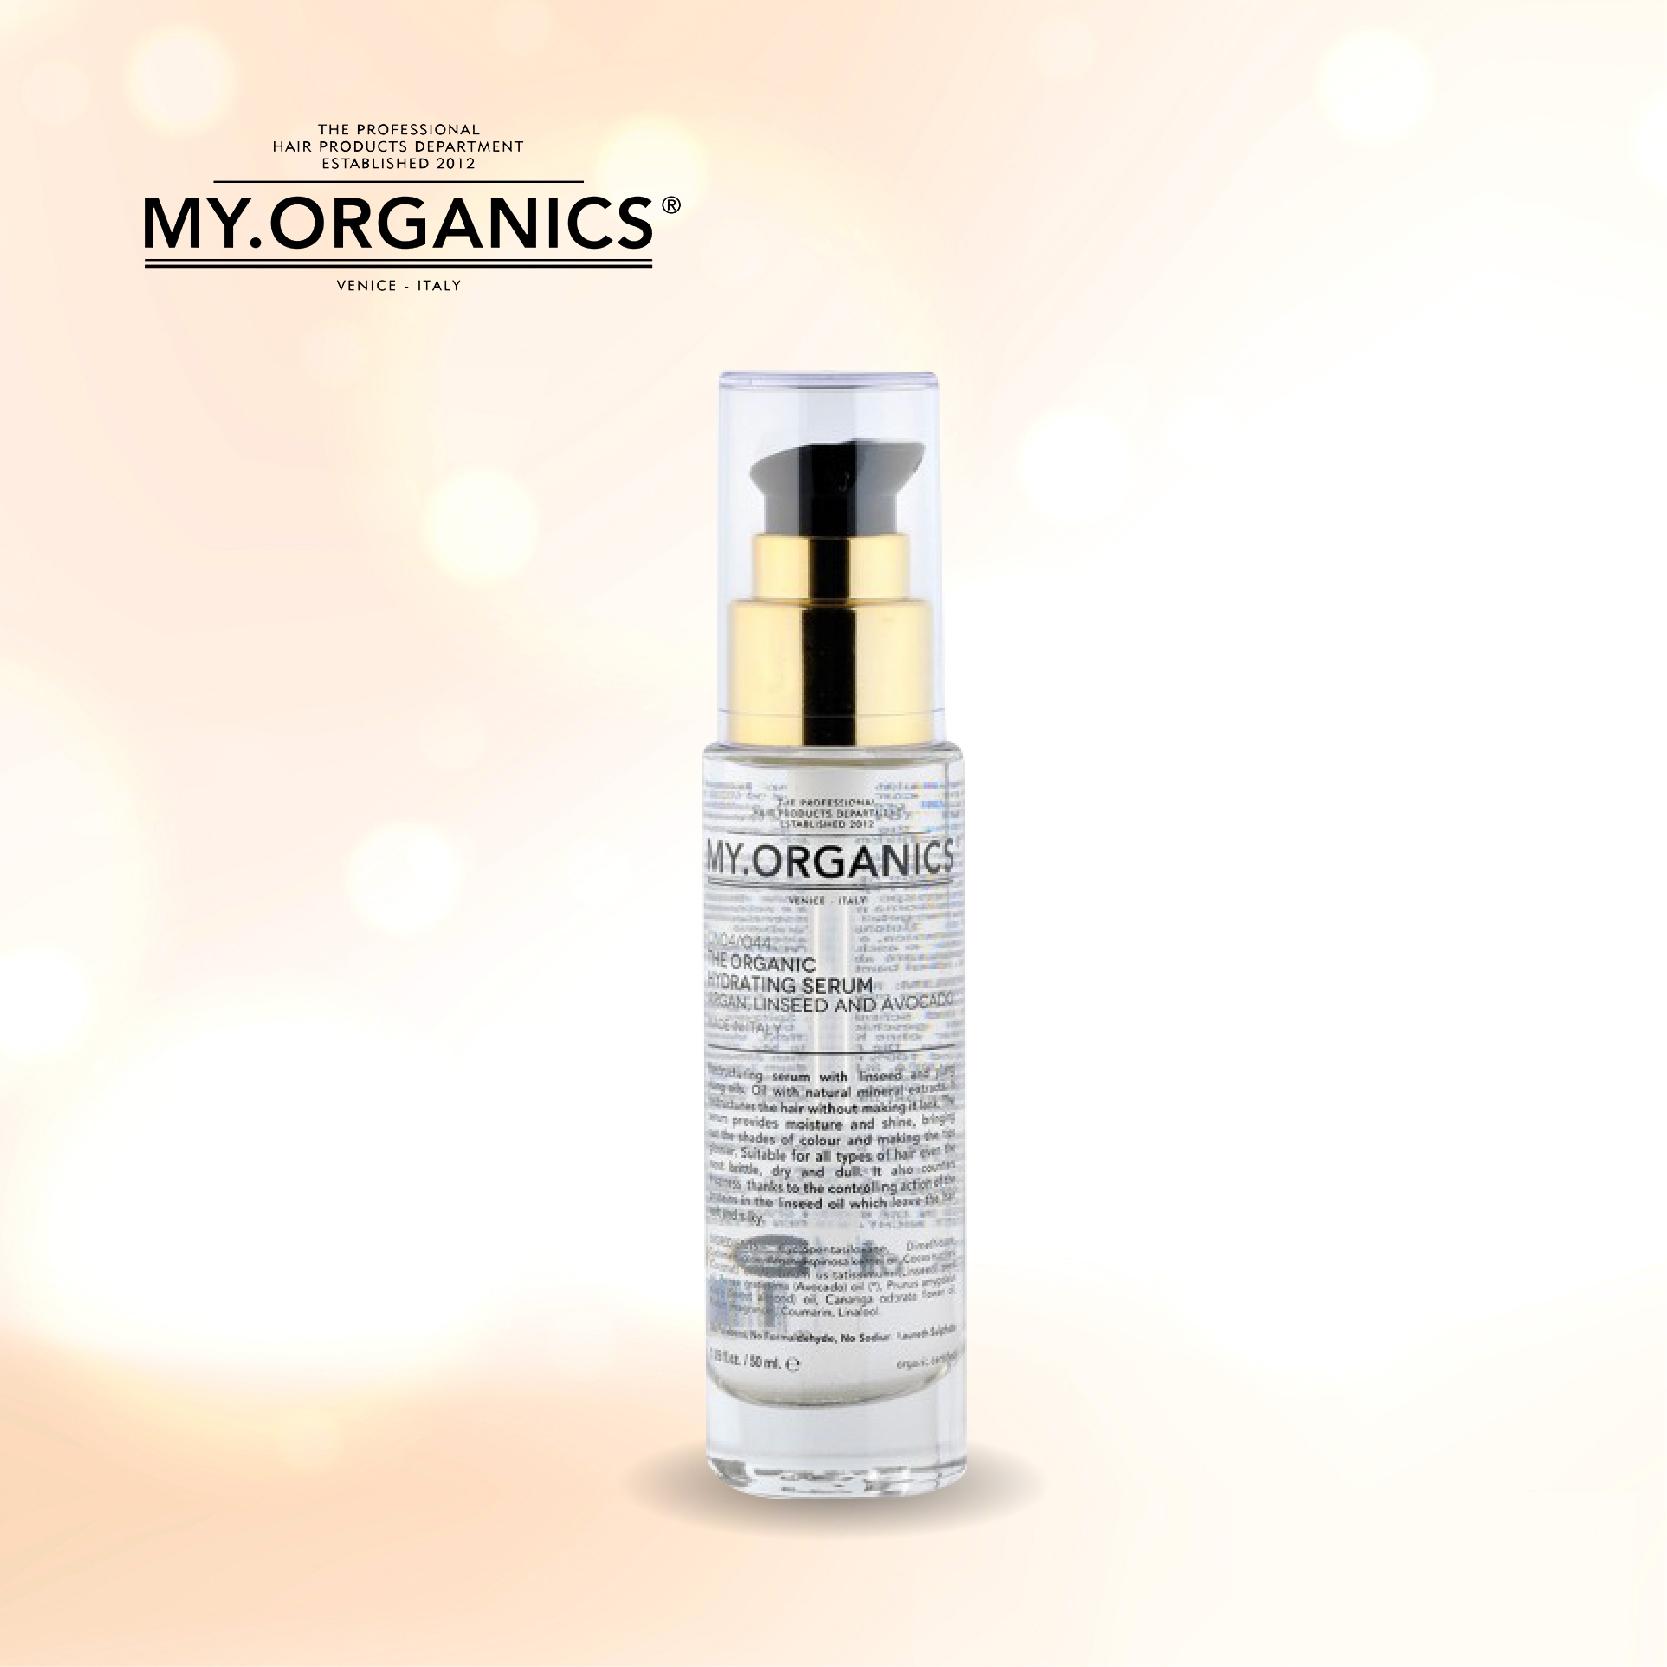 My.Organics 滋补修复秀发精华 50ml